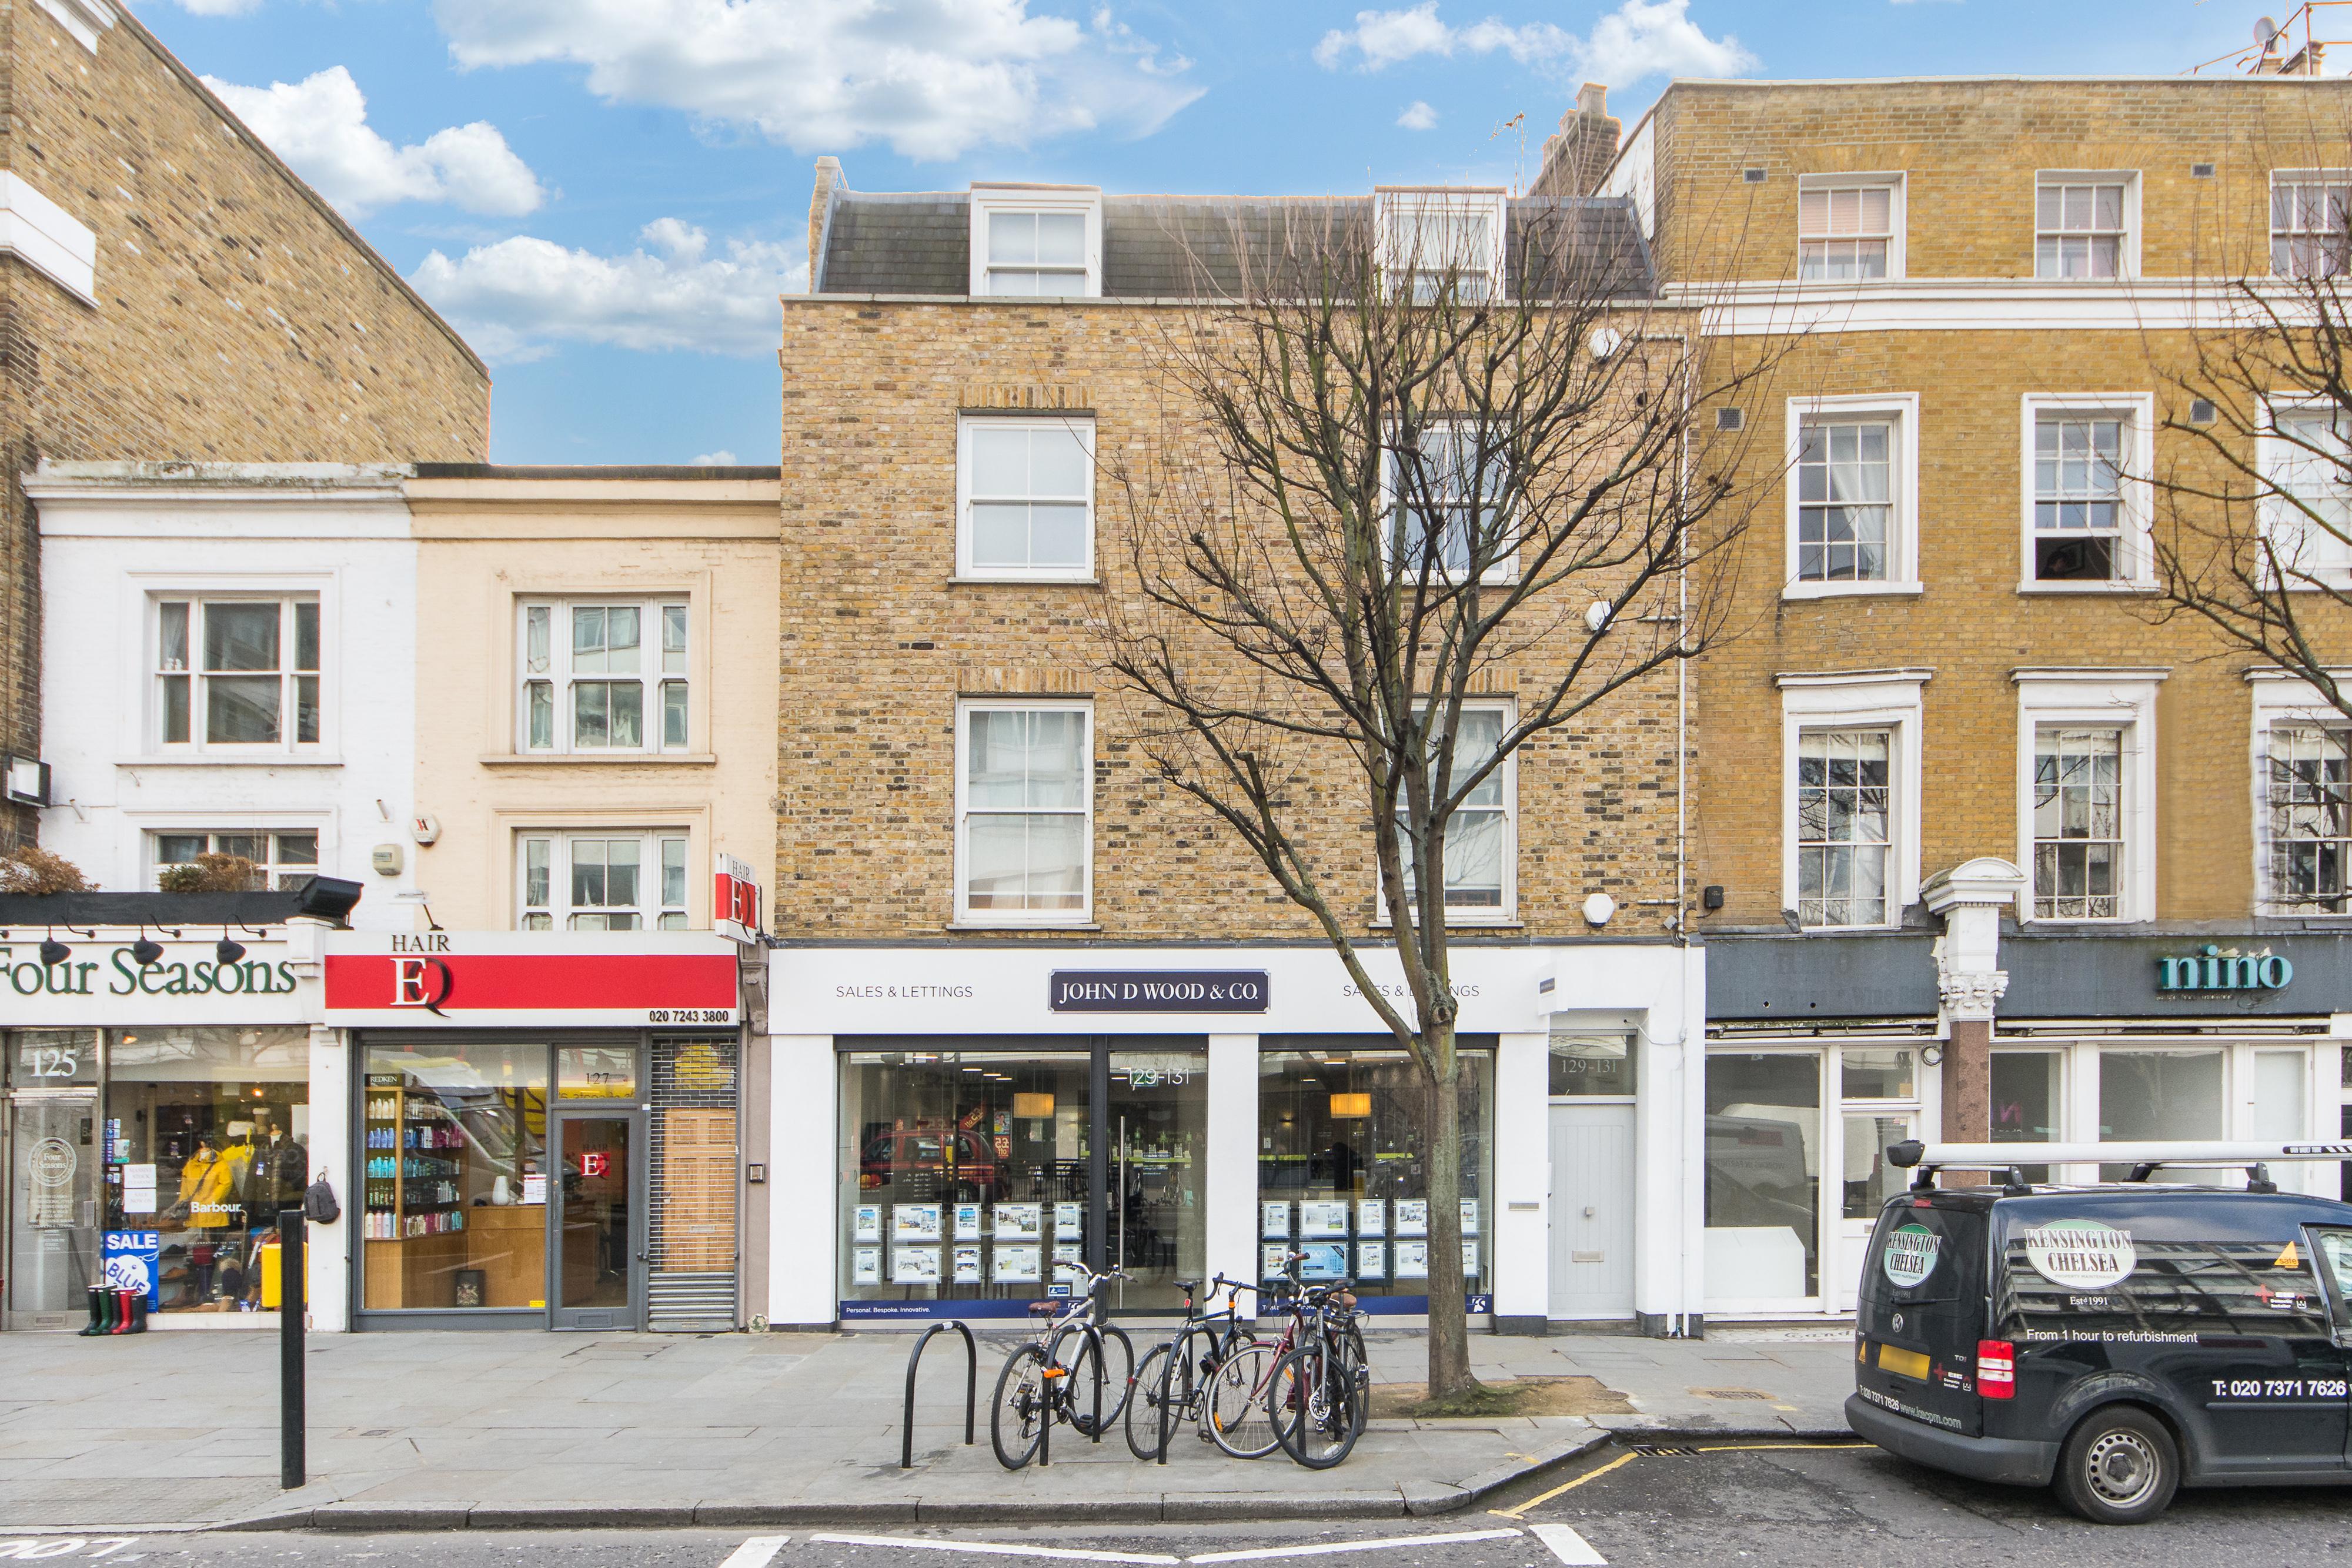 John D Wood & Co Estate Agents Notting Hill